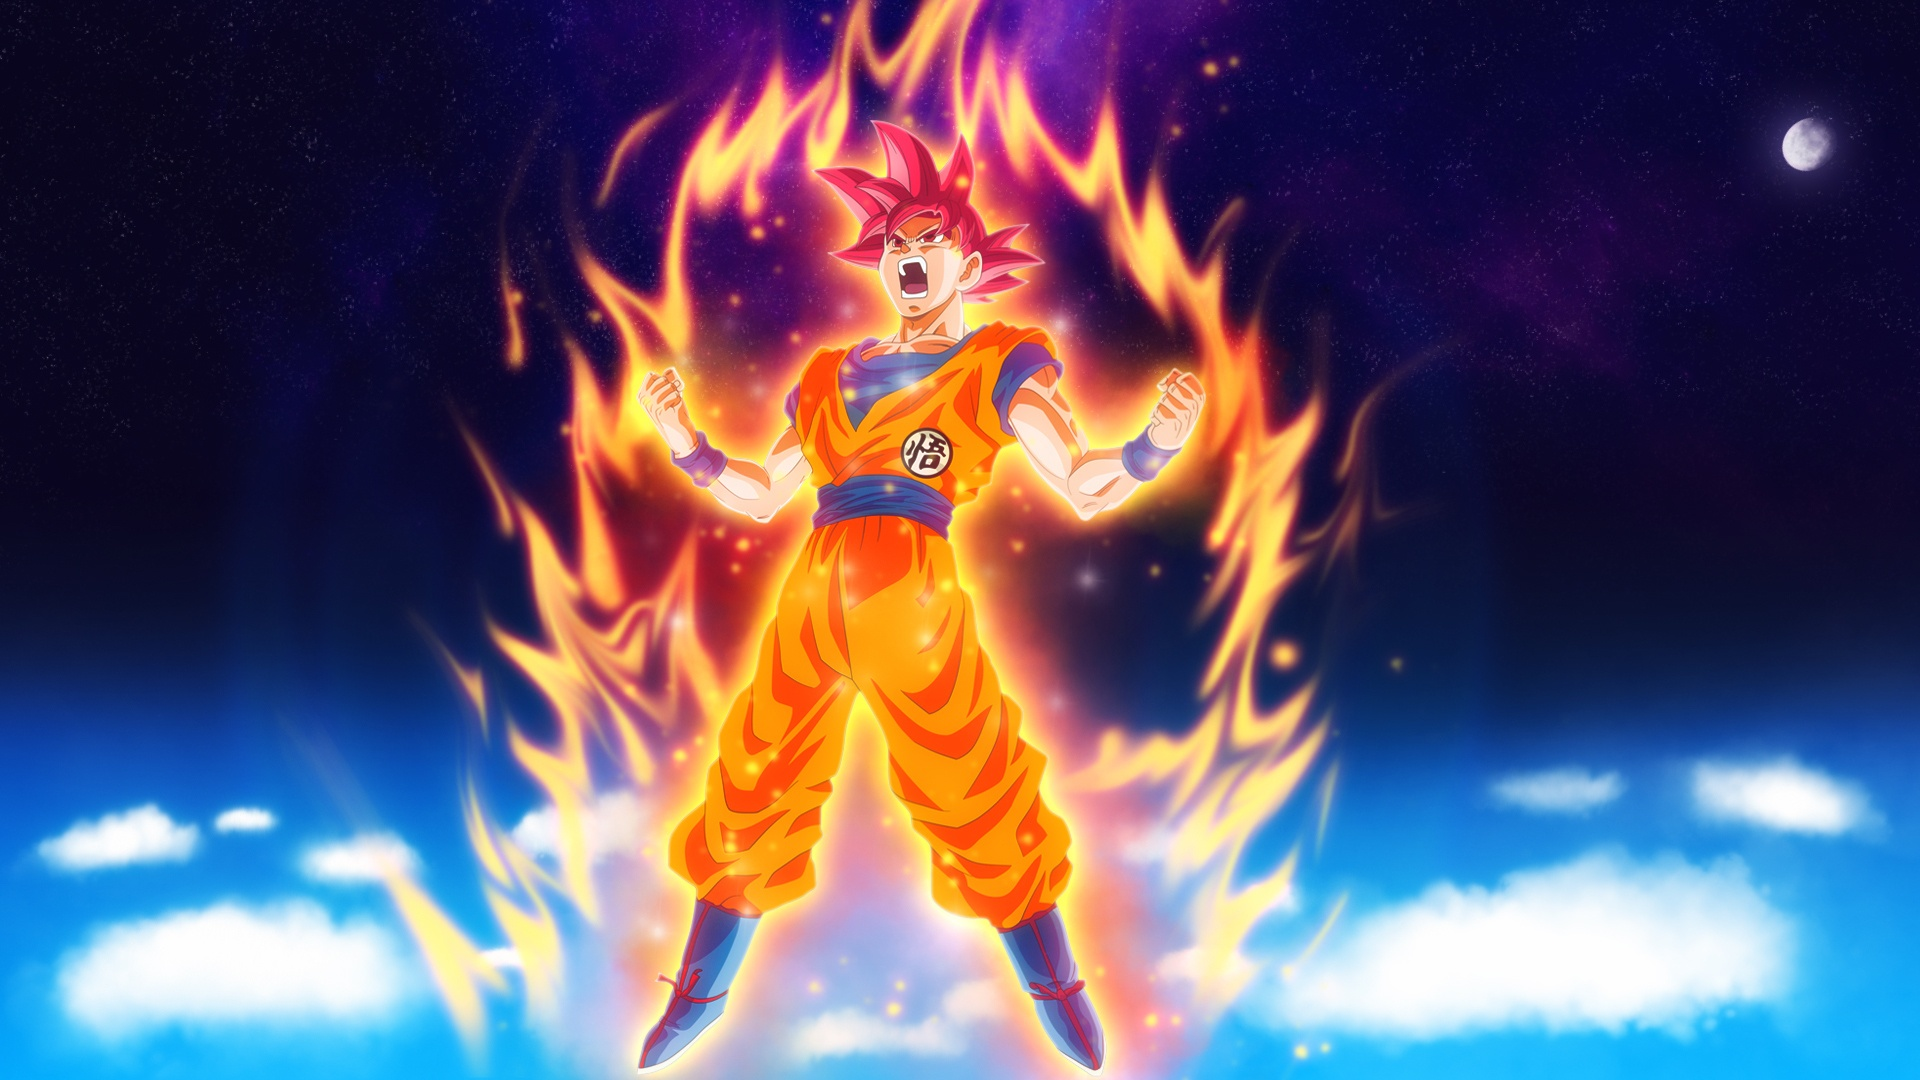 Goku Ultra Instinct best picture